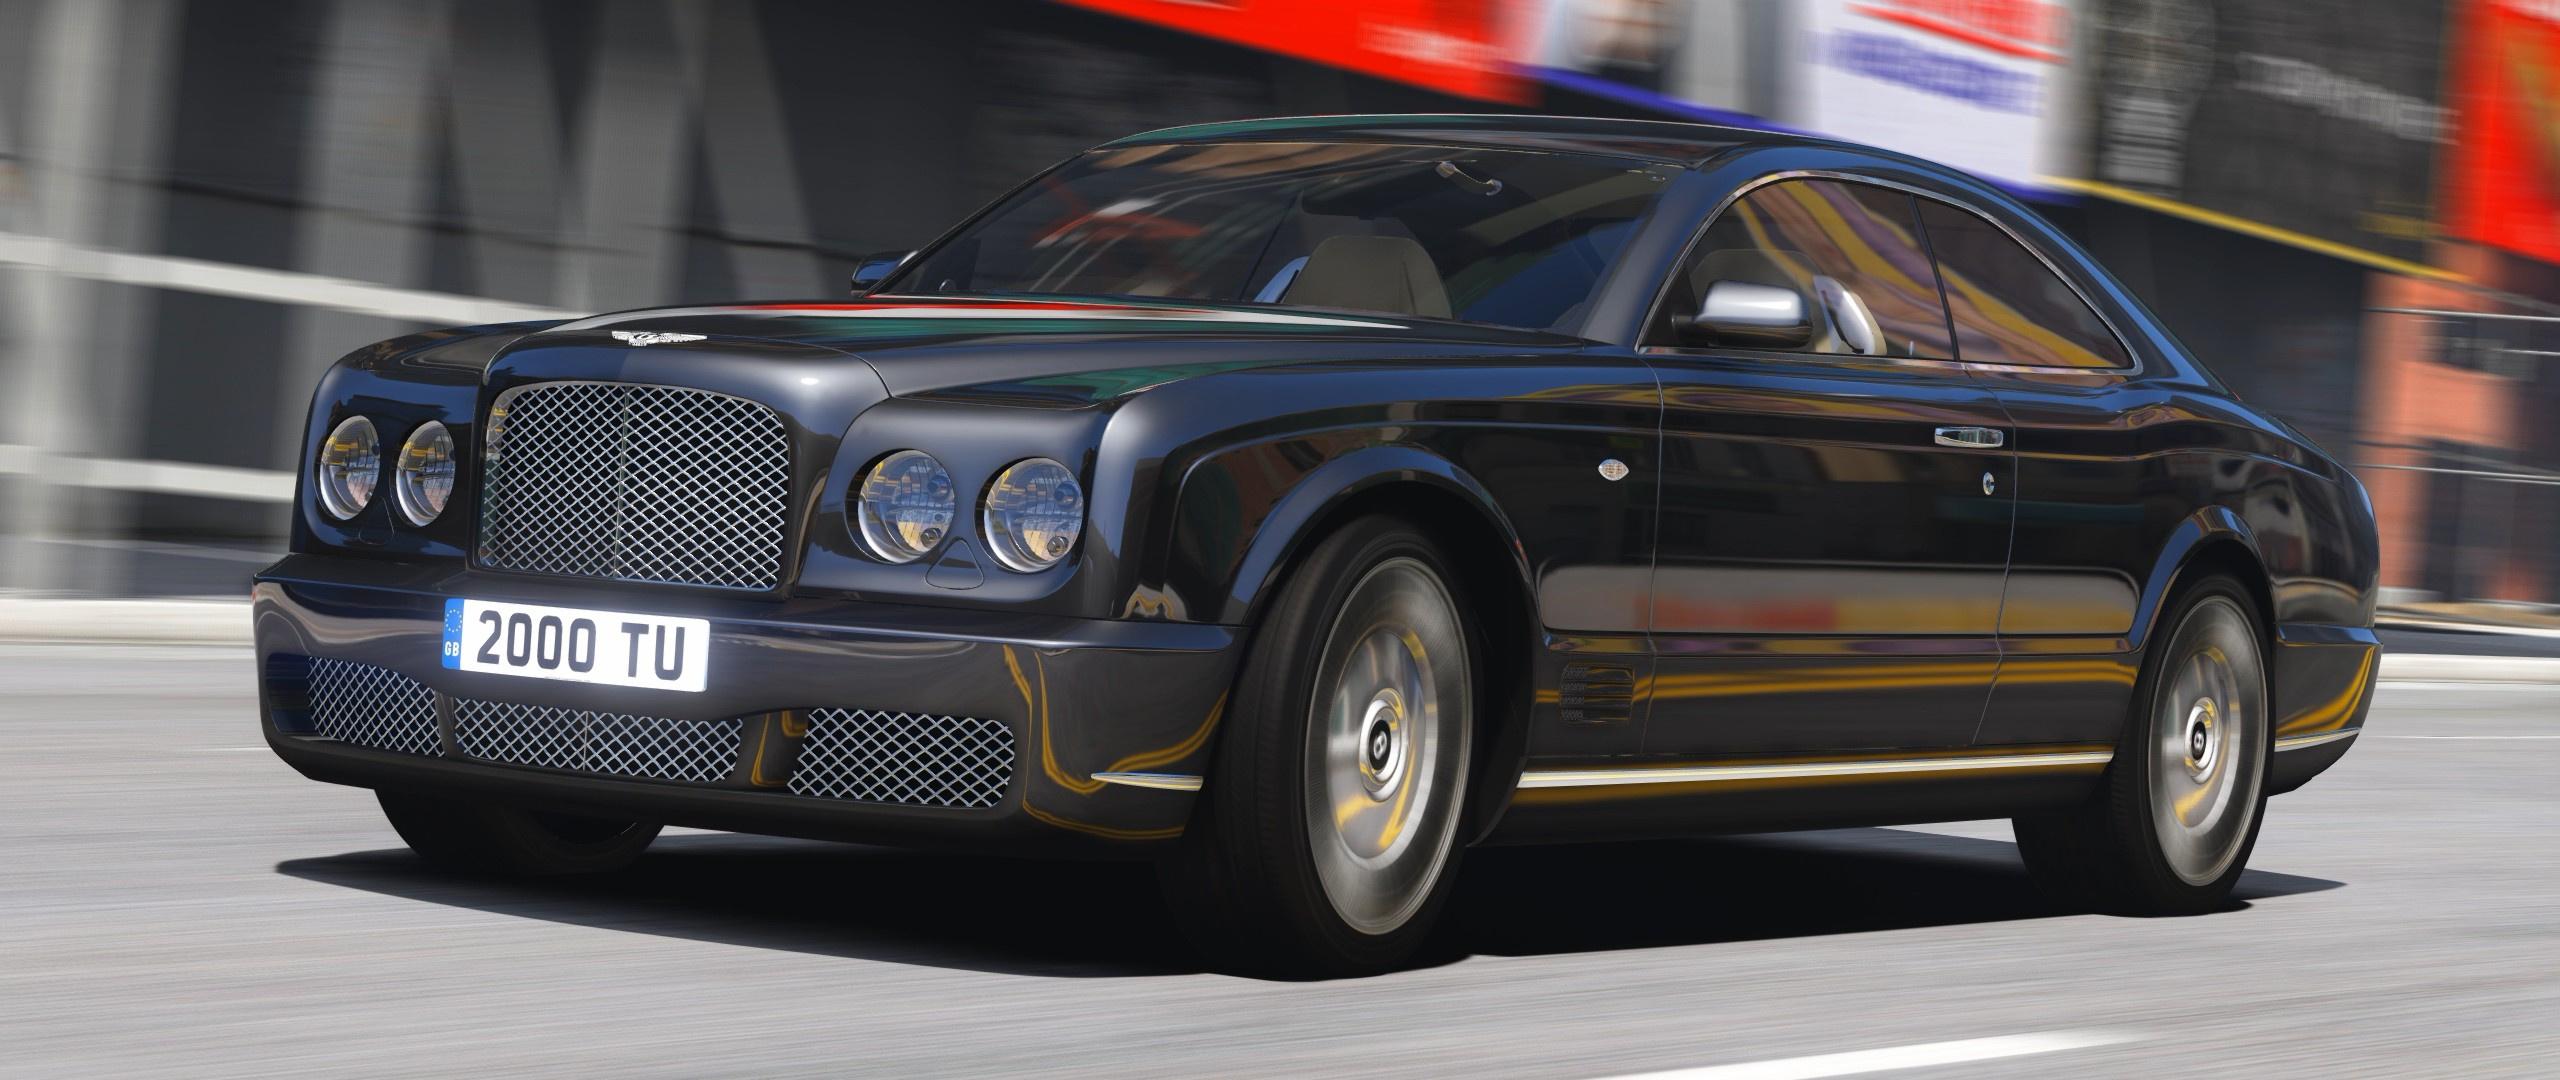 classifieds news of cars sale hemmings price bentley brooklands motor mulliner r for